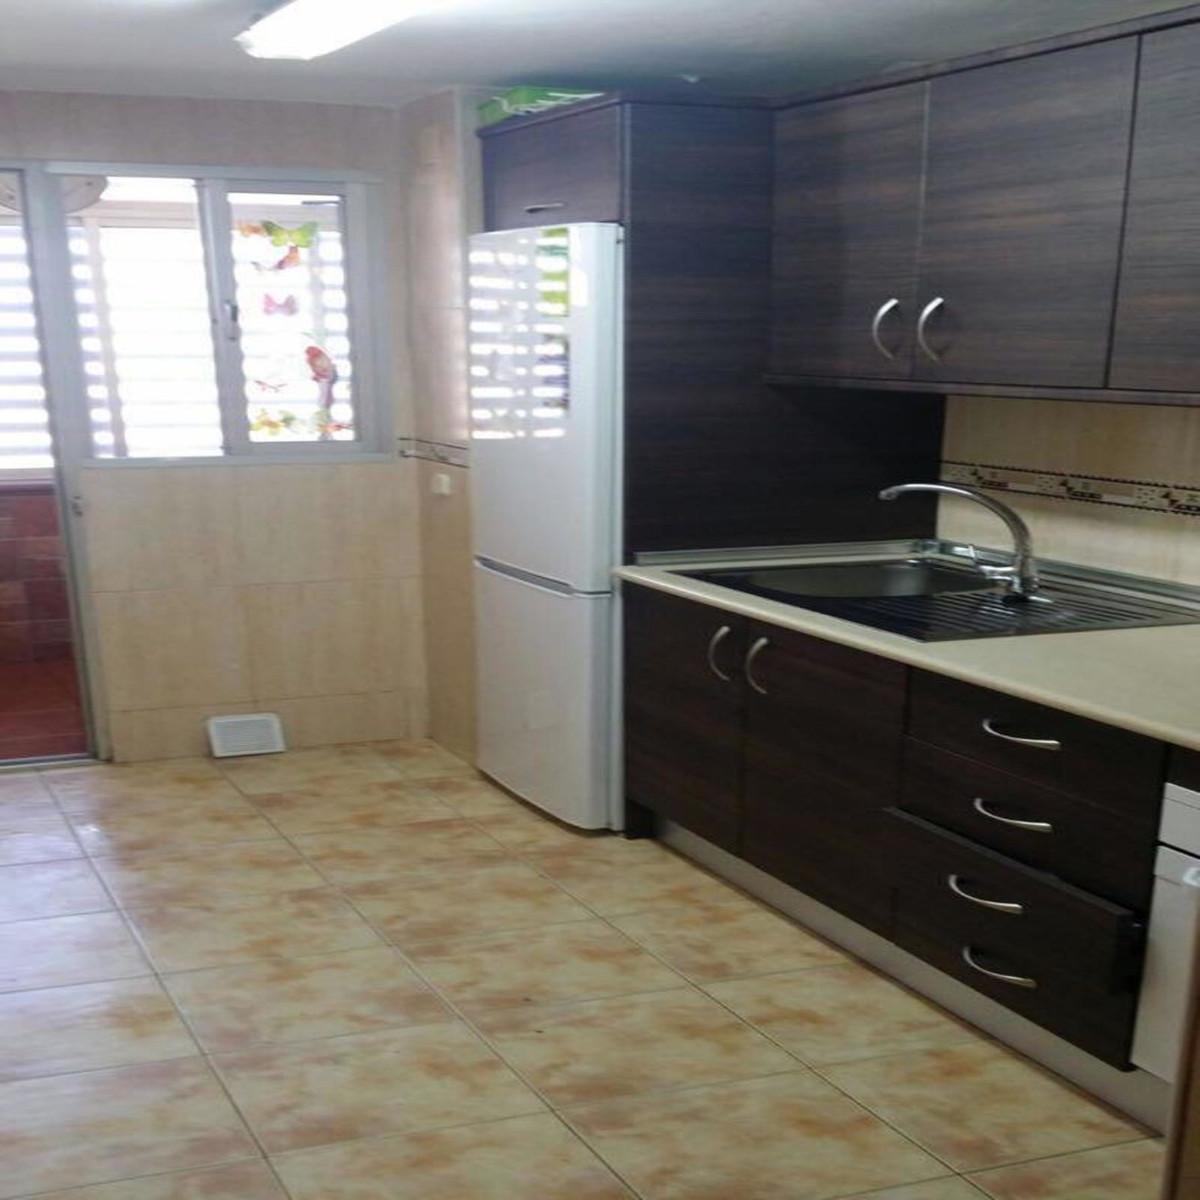 IBI; 350€ / per year    Community Fee: 40€ / per month  Apartament located in Centre 3 bedrooms 1 ba,Spain